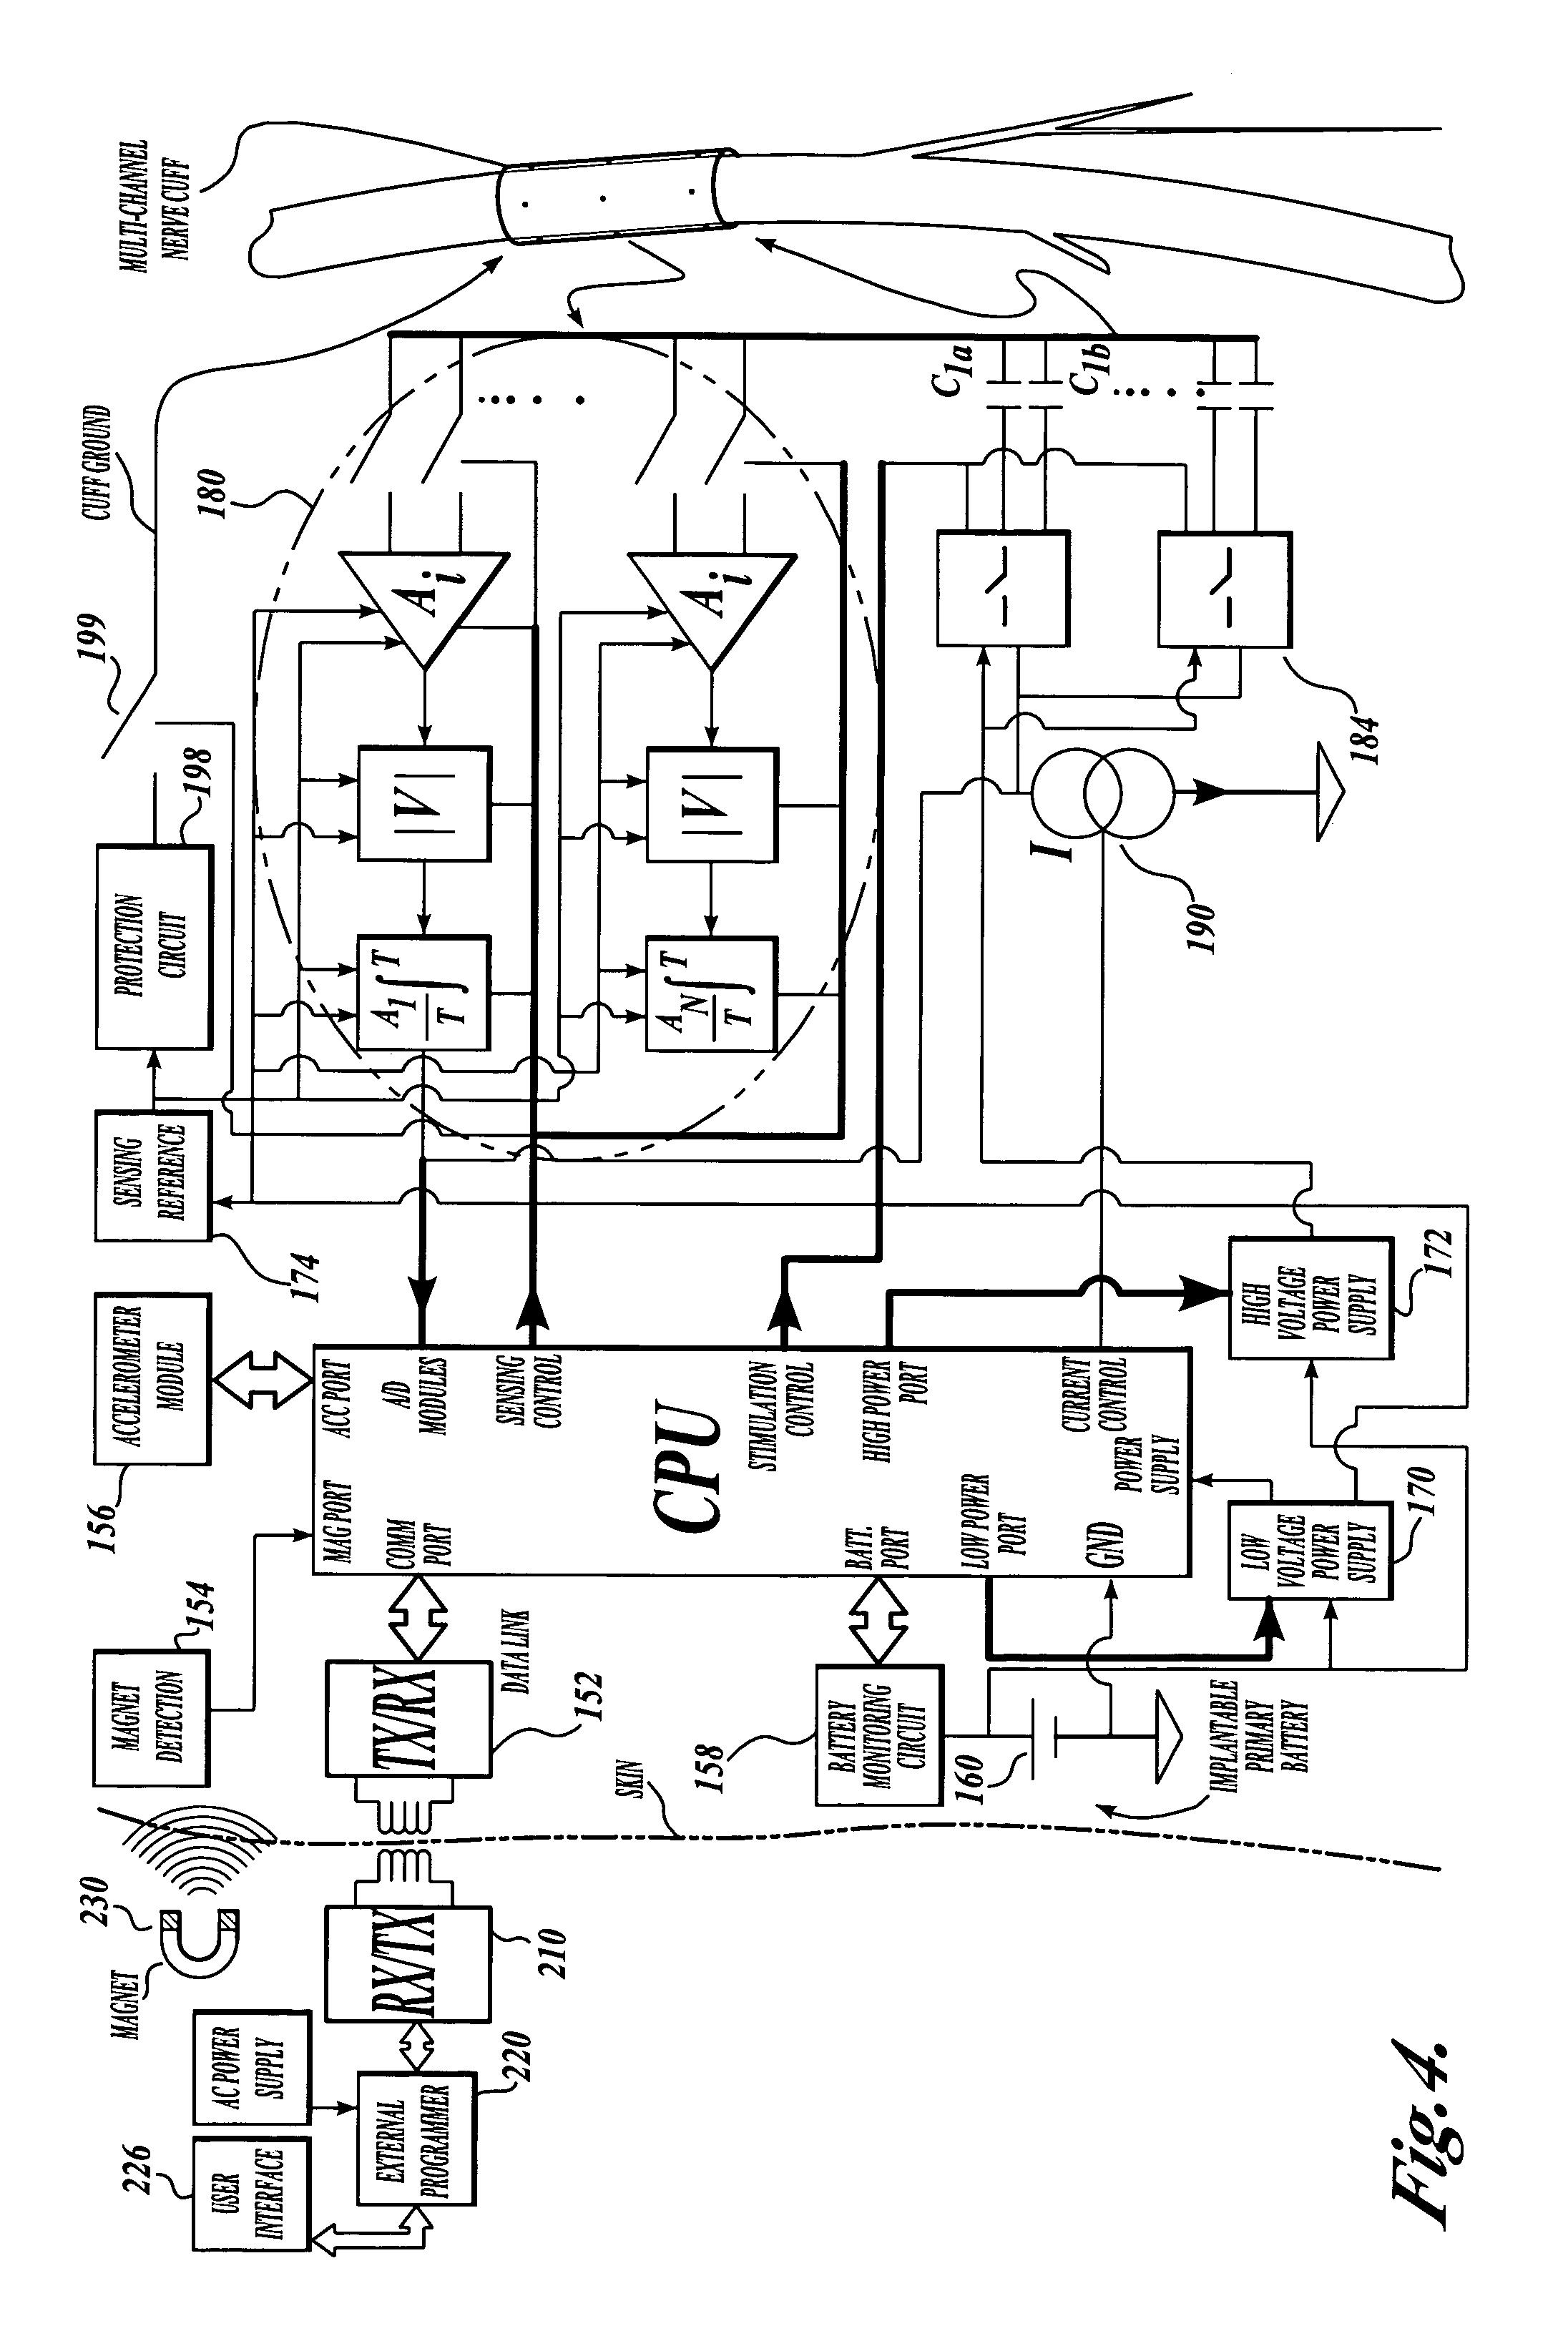 patente us20050010265